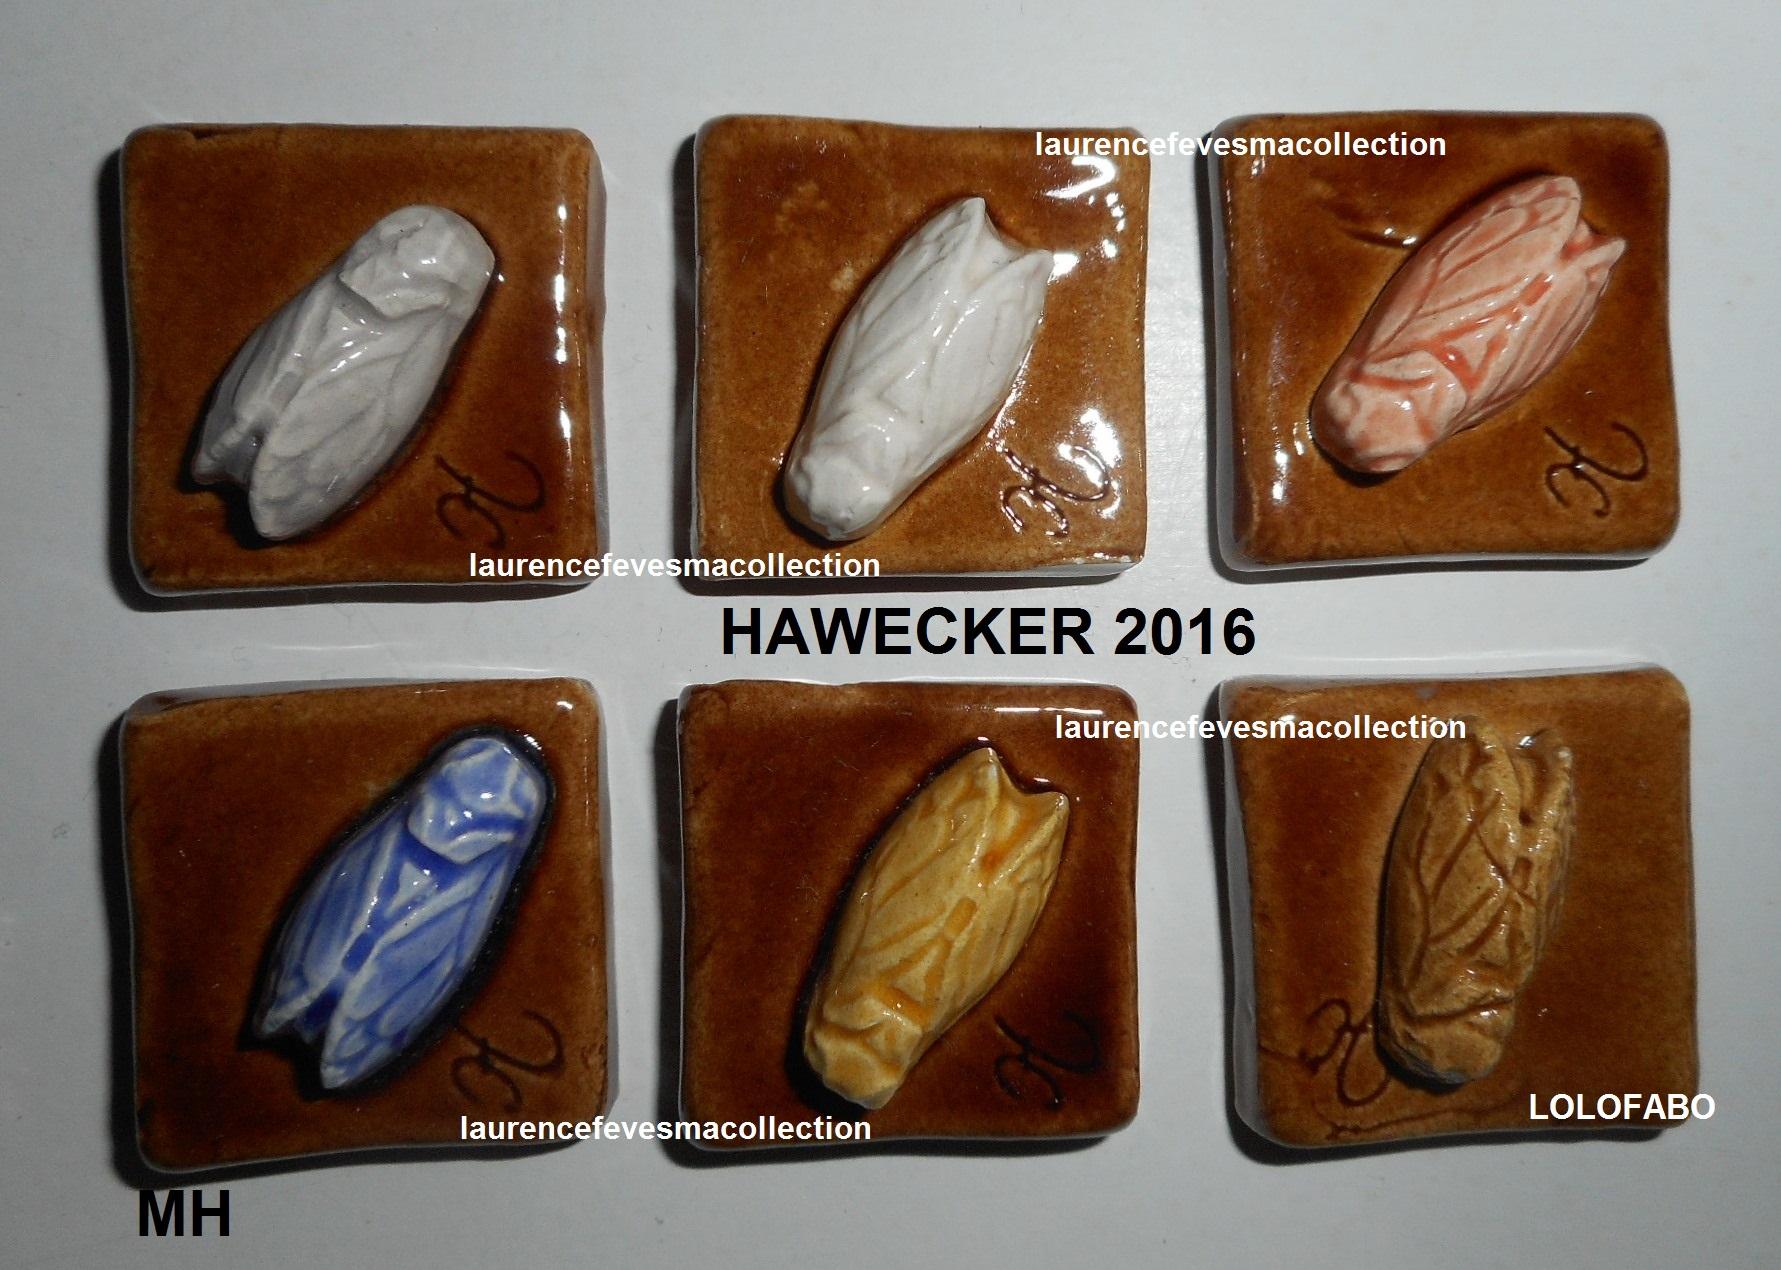 2016 hawecker 2016 mh